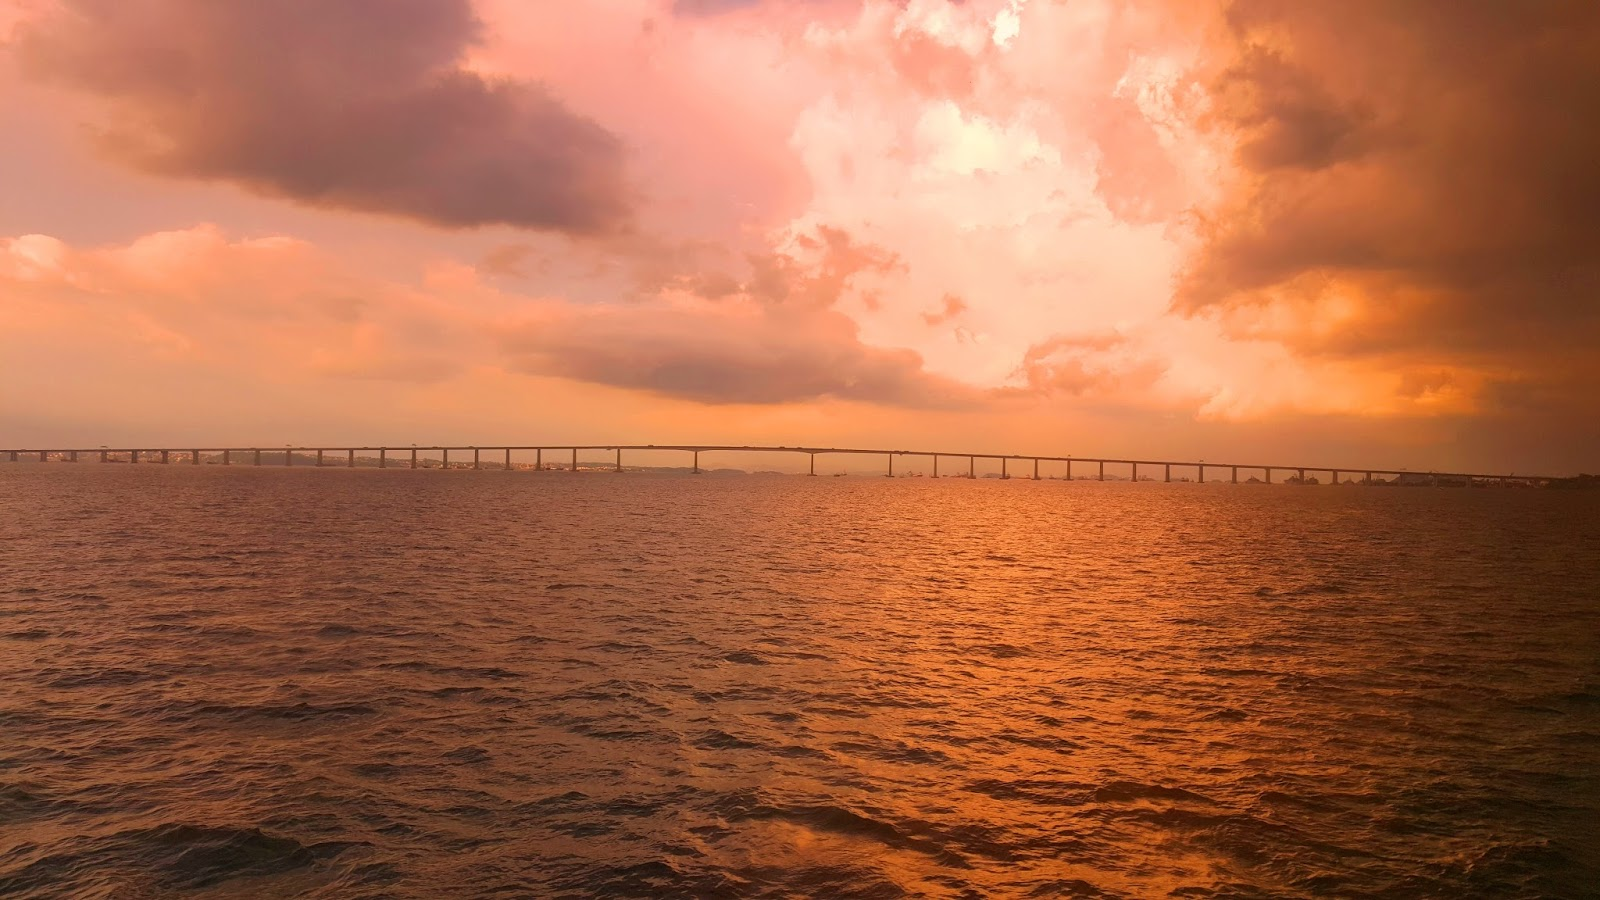 ponte-Rio-Niteroi-vista-da-barca-Rio-Niteroi